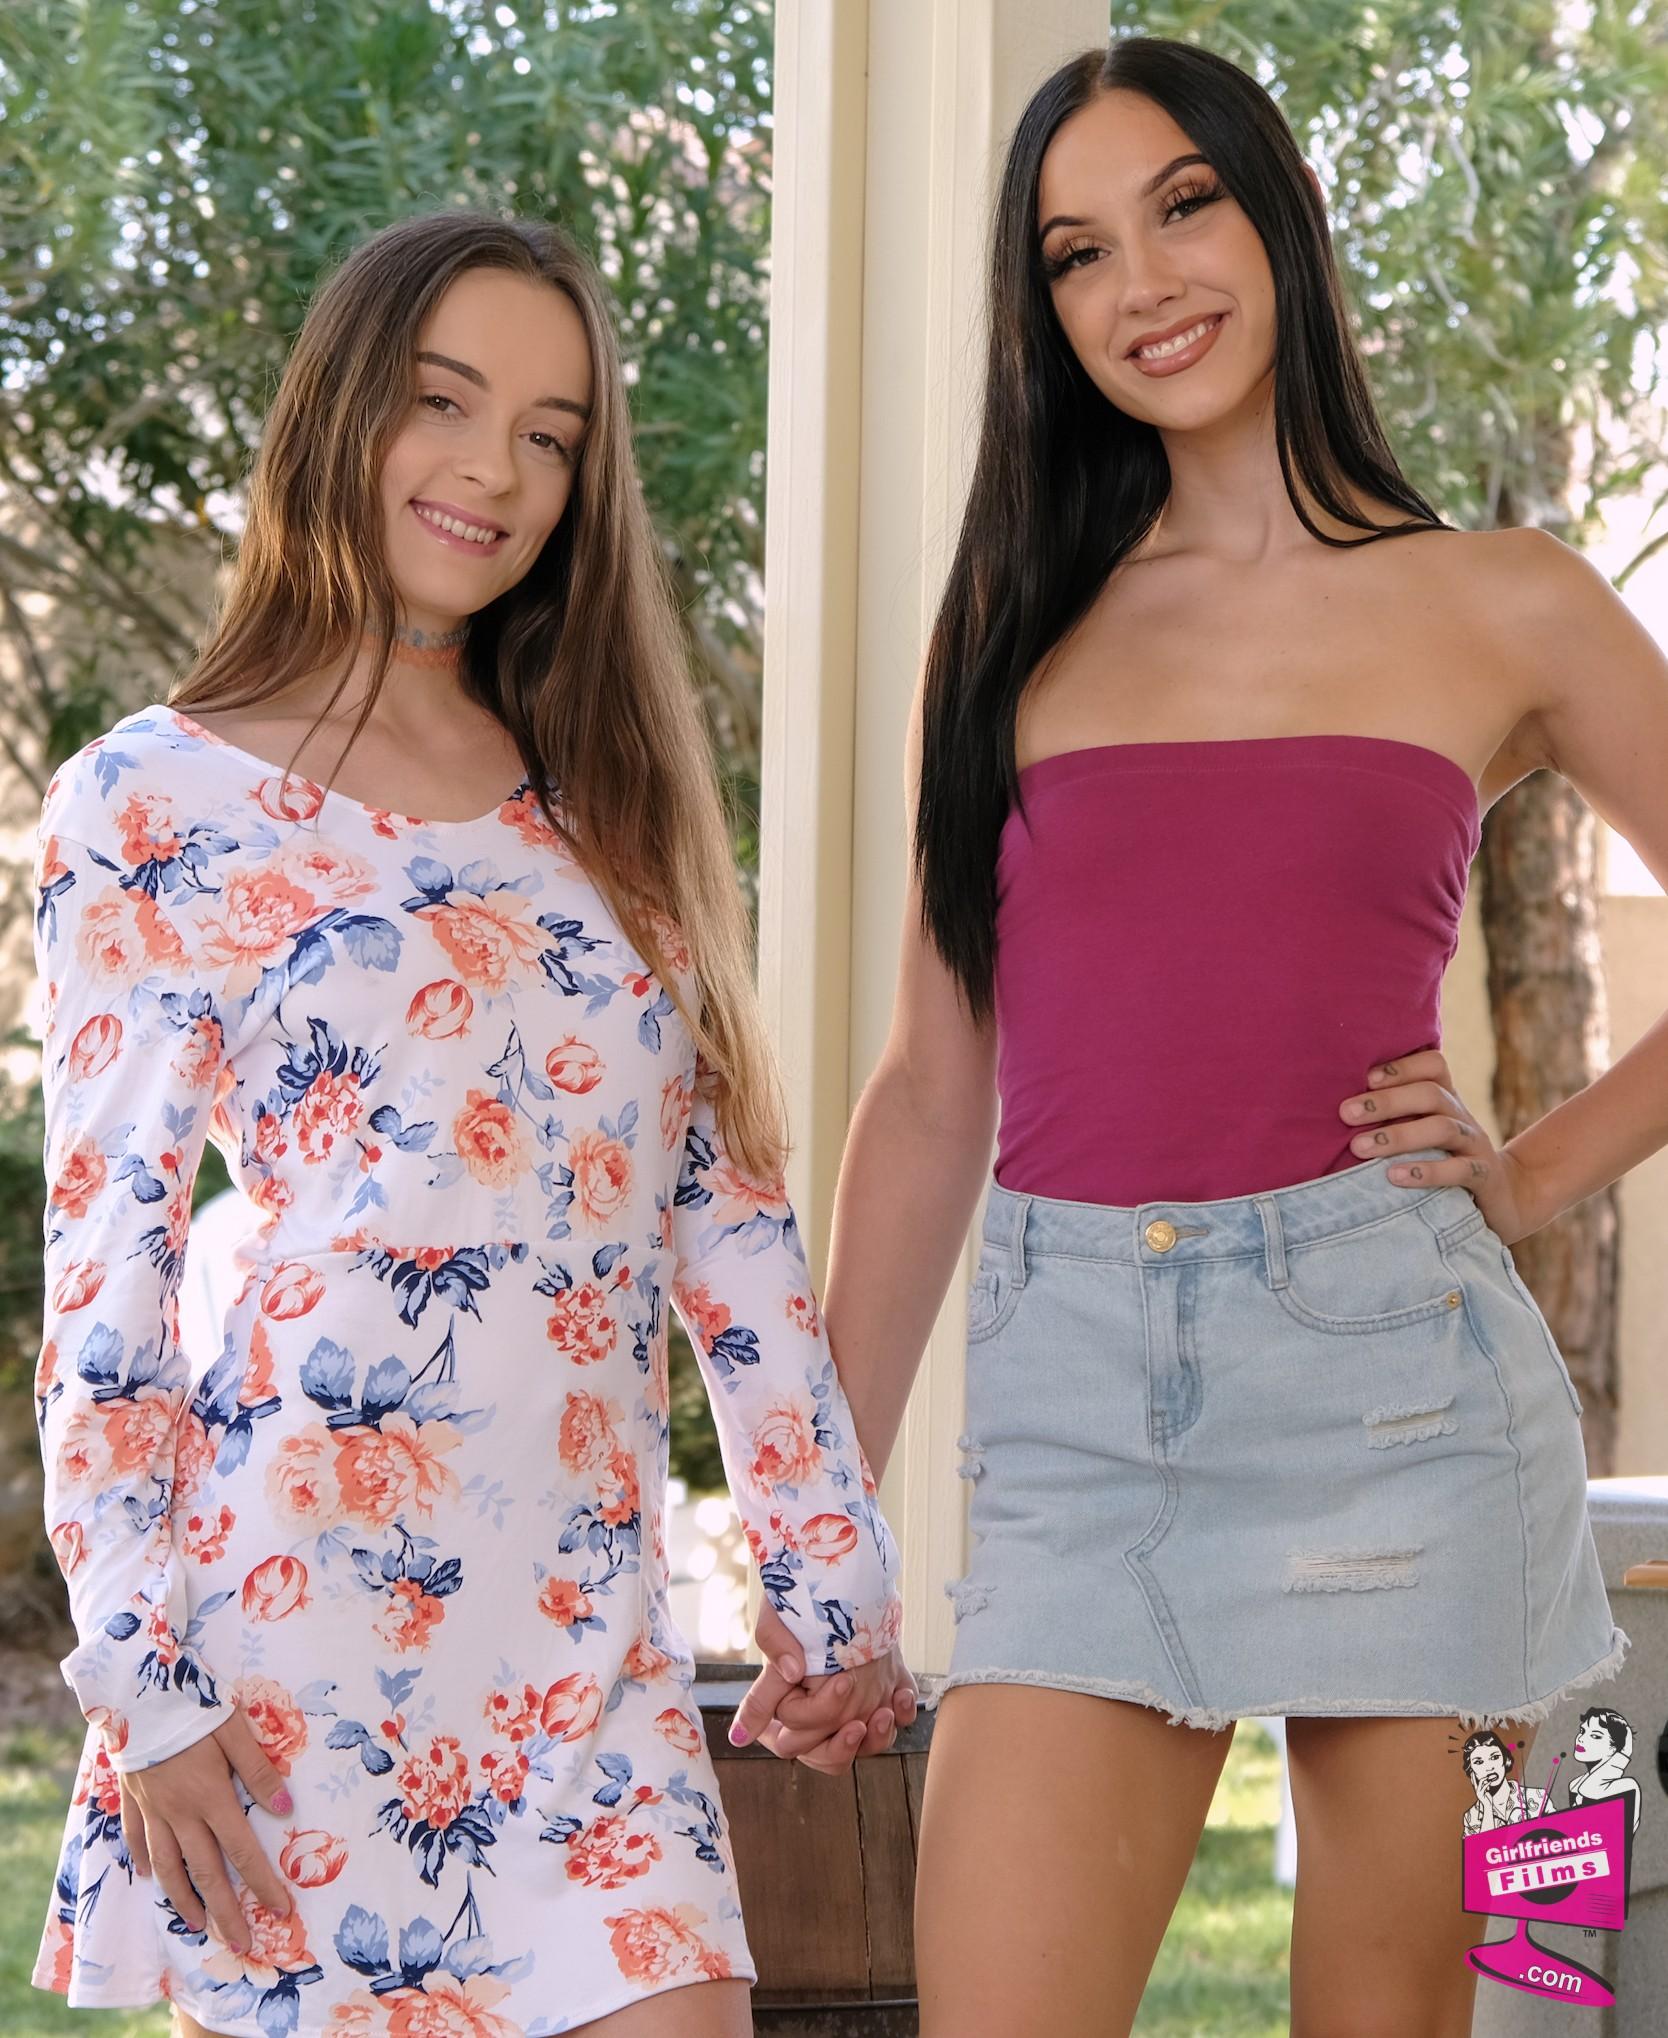 Lily Glee and Jazmin Luv